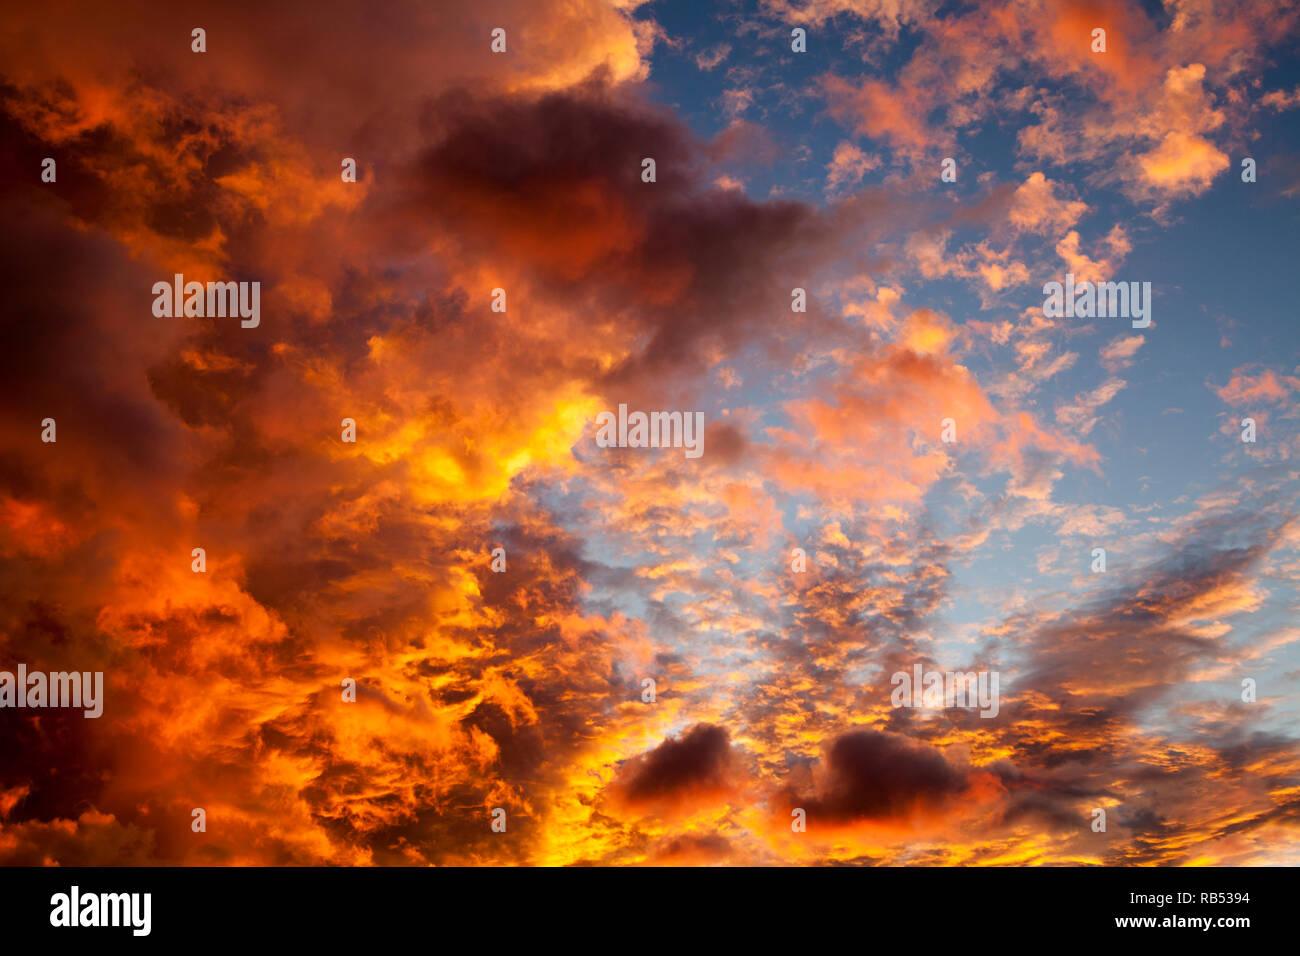 Sonnenaufgang - Stock Image